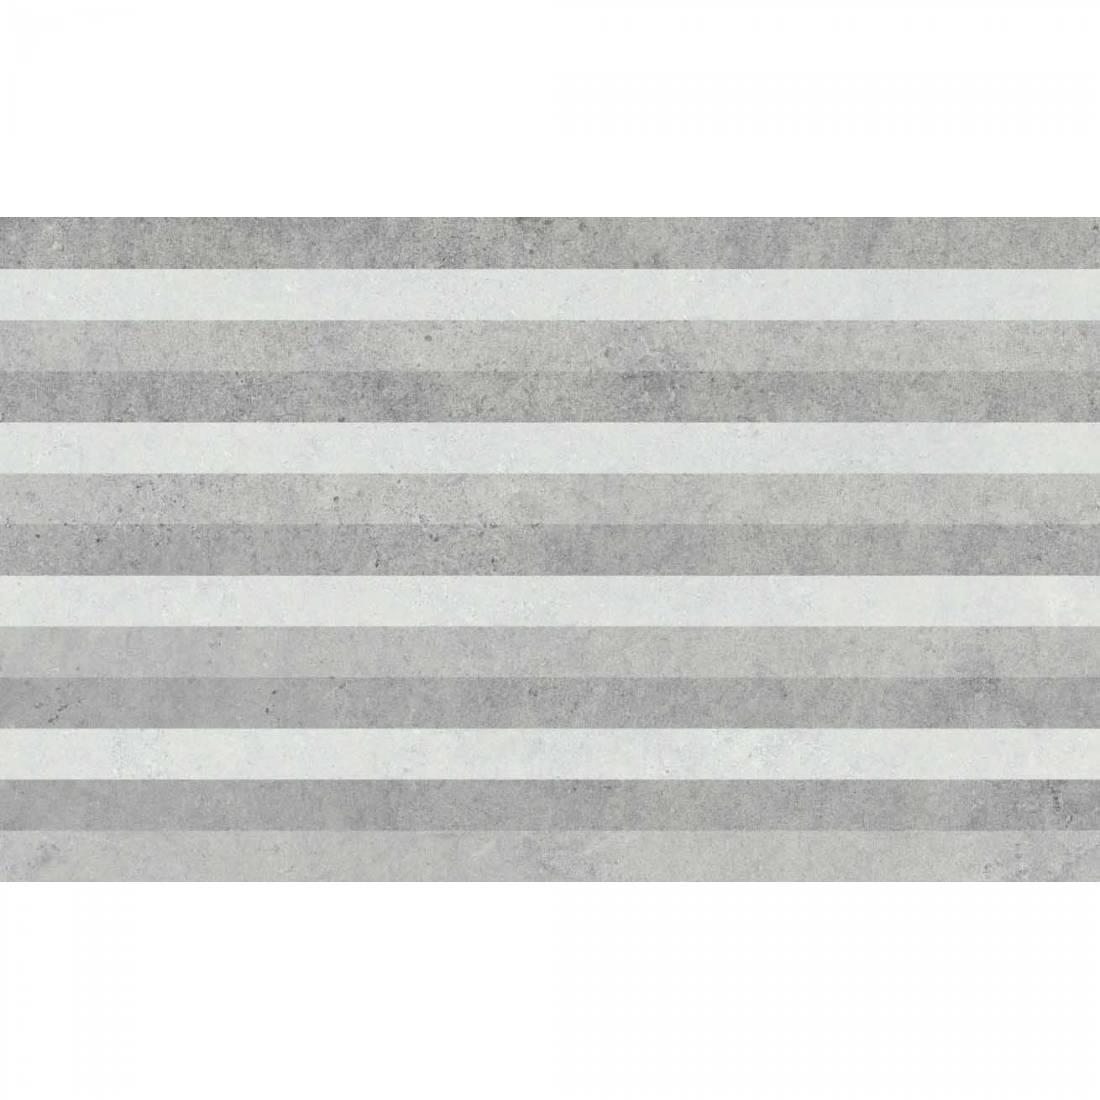 Marylebone Shutter 33.3x55 Pewter Gloss 1